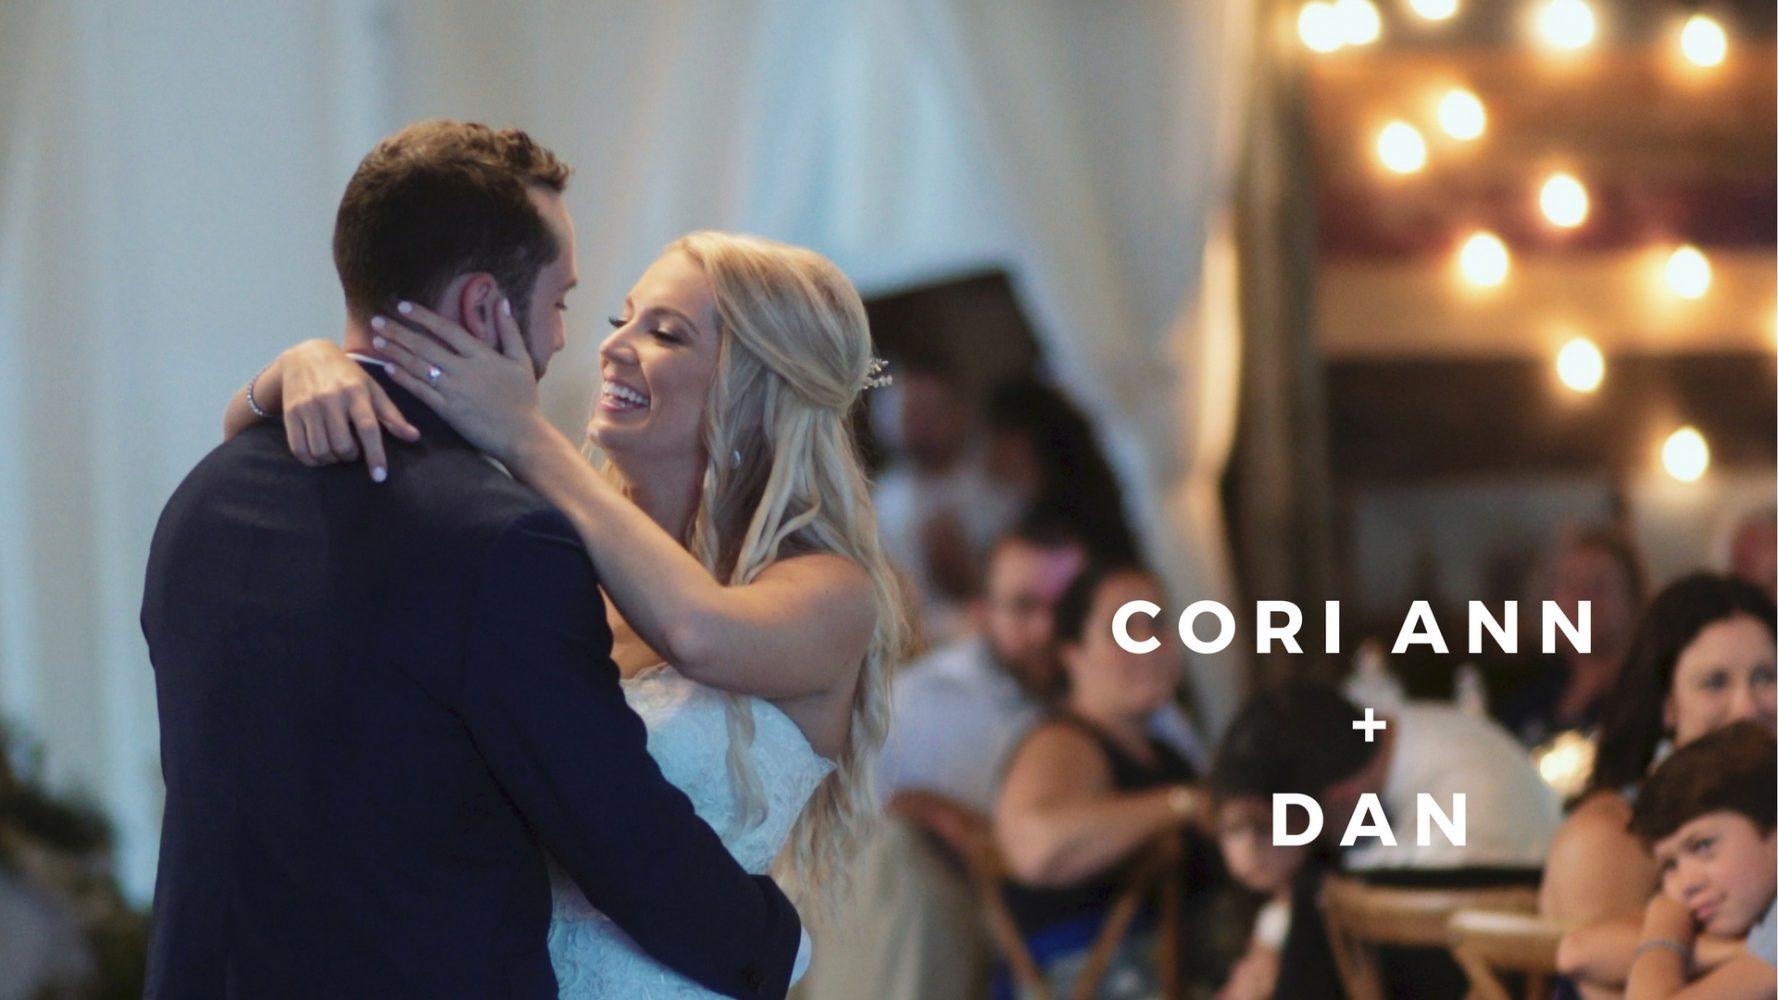 Cori Ann + Dan Sherwin | Winthrop, Maine